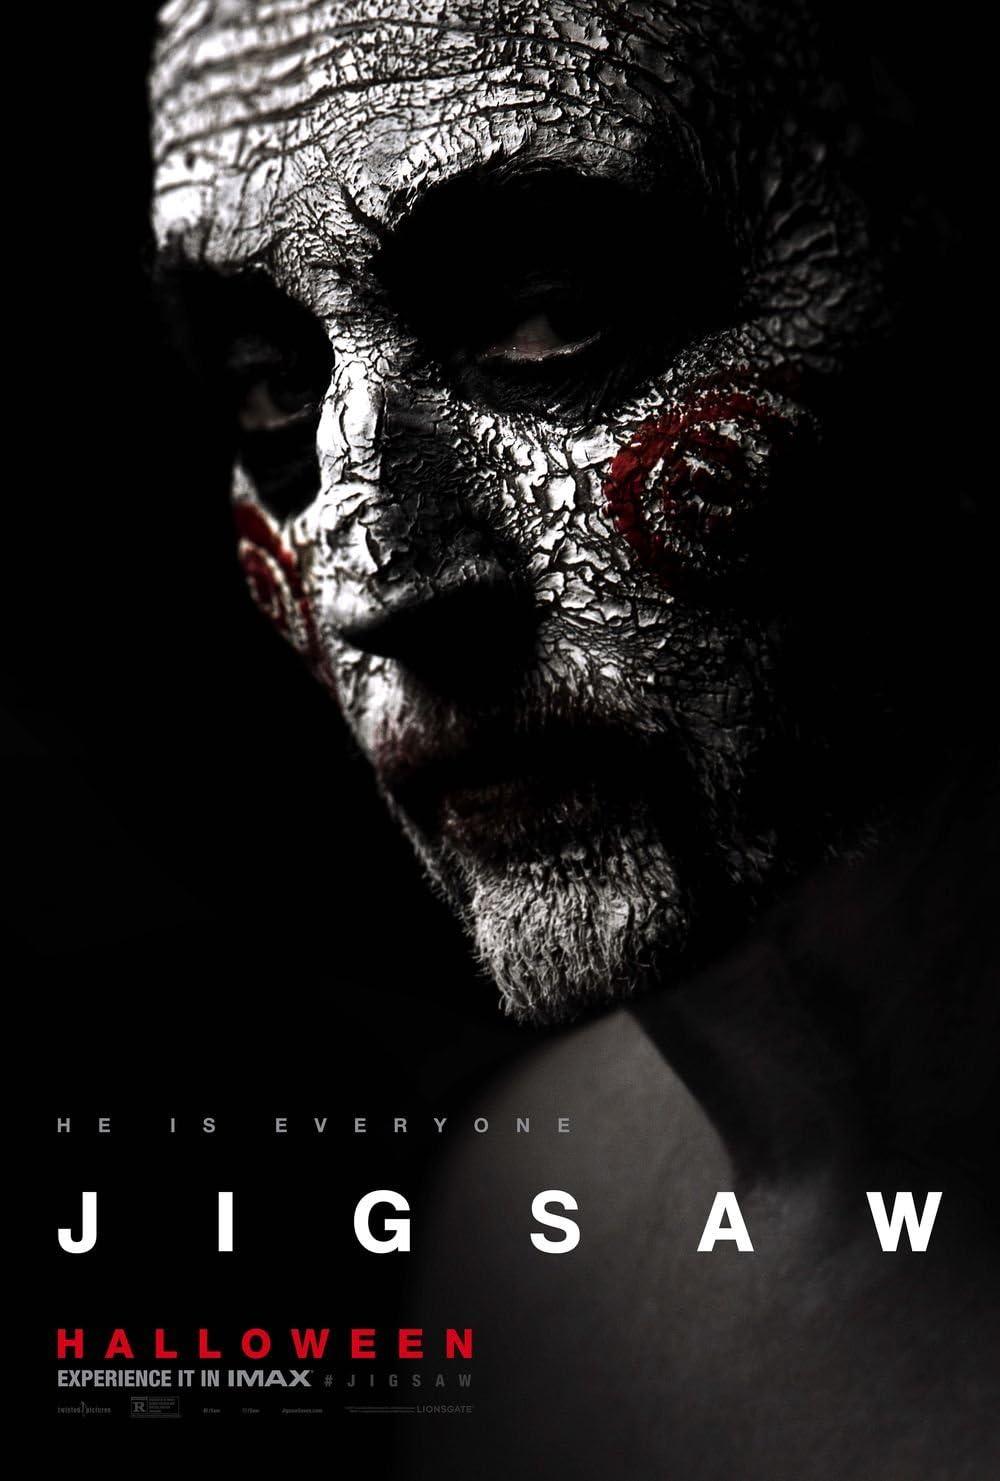 Amazon.com: Kirbis Jigsaw Movie Poster 18 x 28 Inches: Posters & Prints